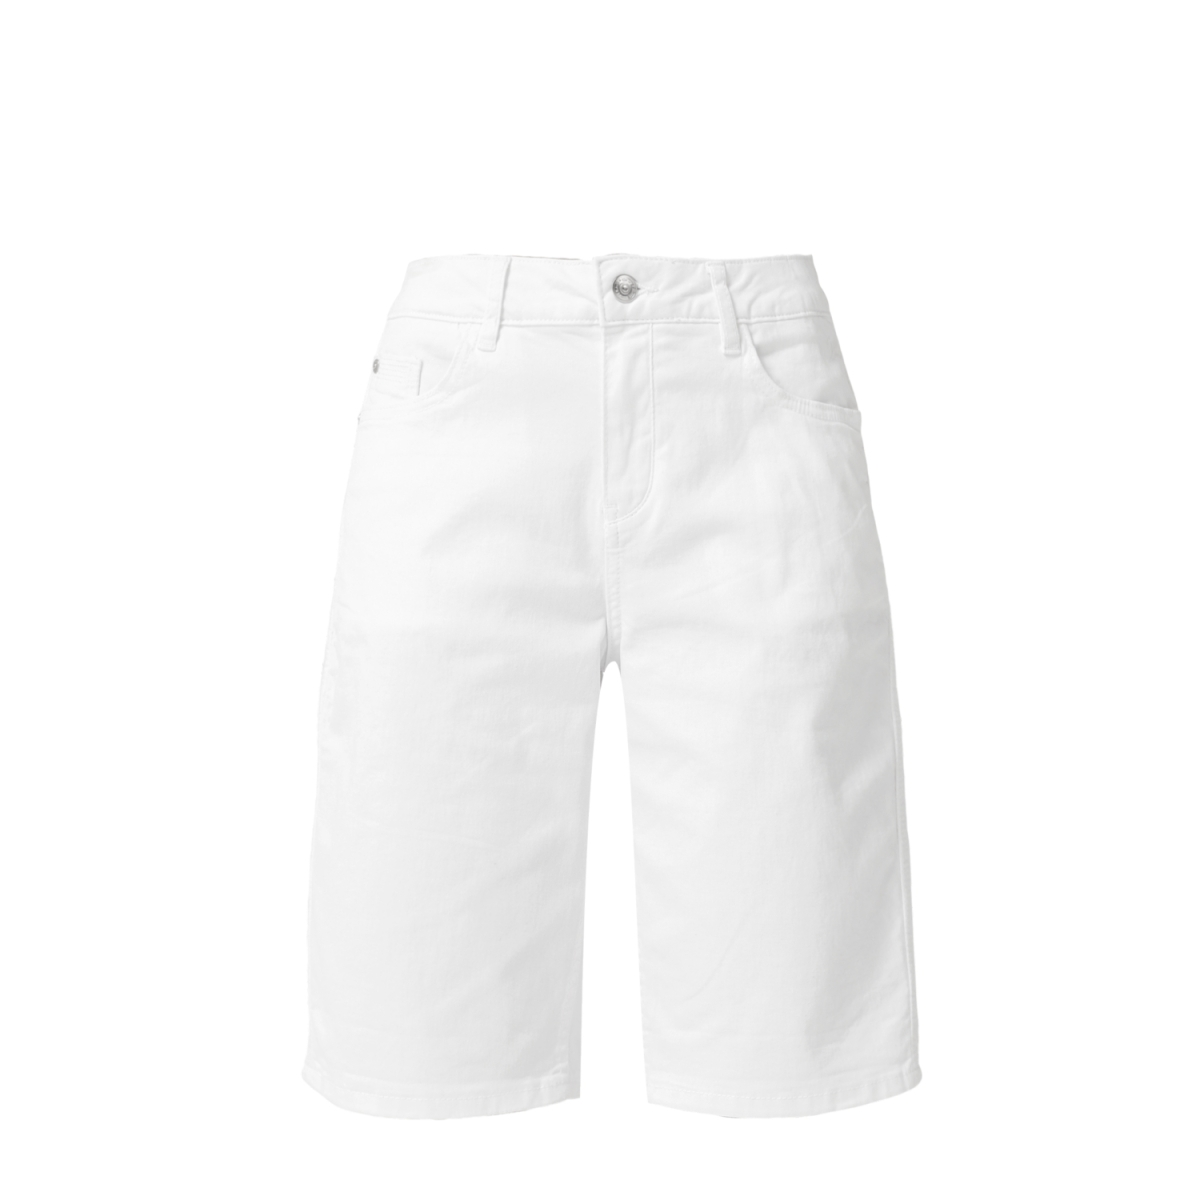 bermuda 04899745085 s.oliver korte broek 0100